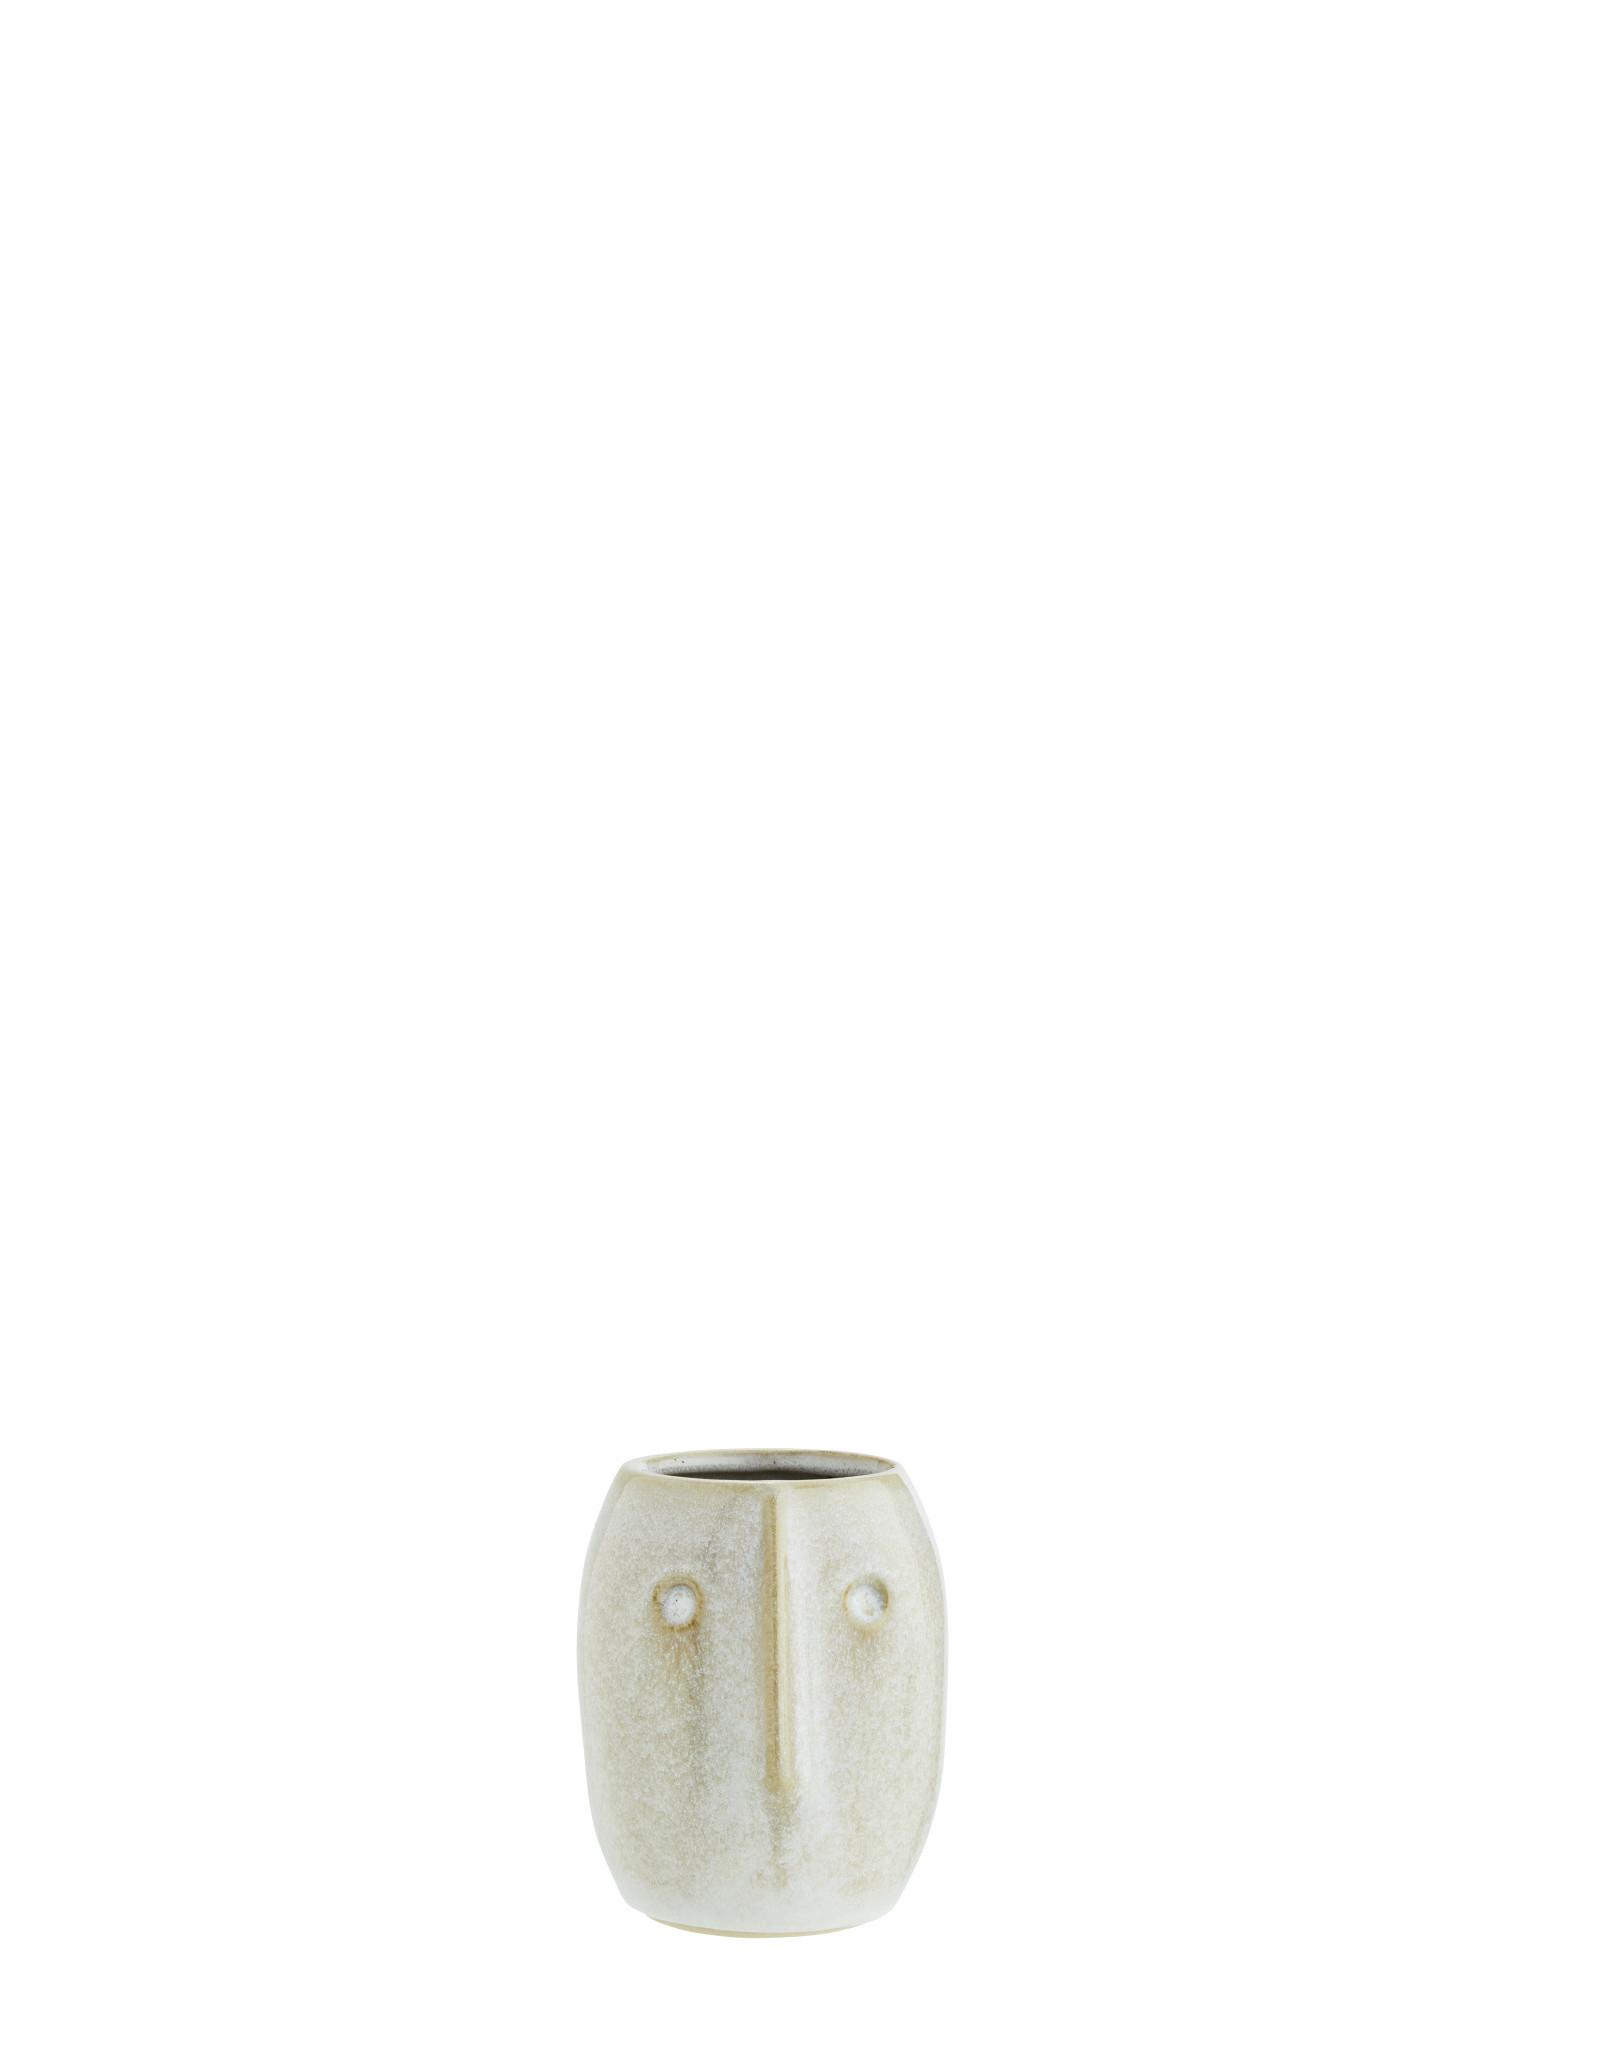 Madam Stolz Bloempot met gezicht - Gebroken wit, naturel - Ø 8 x H 10 cm - Rond